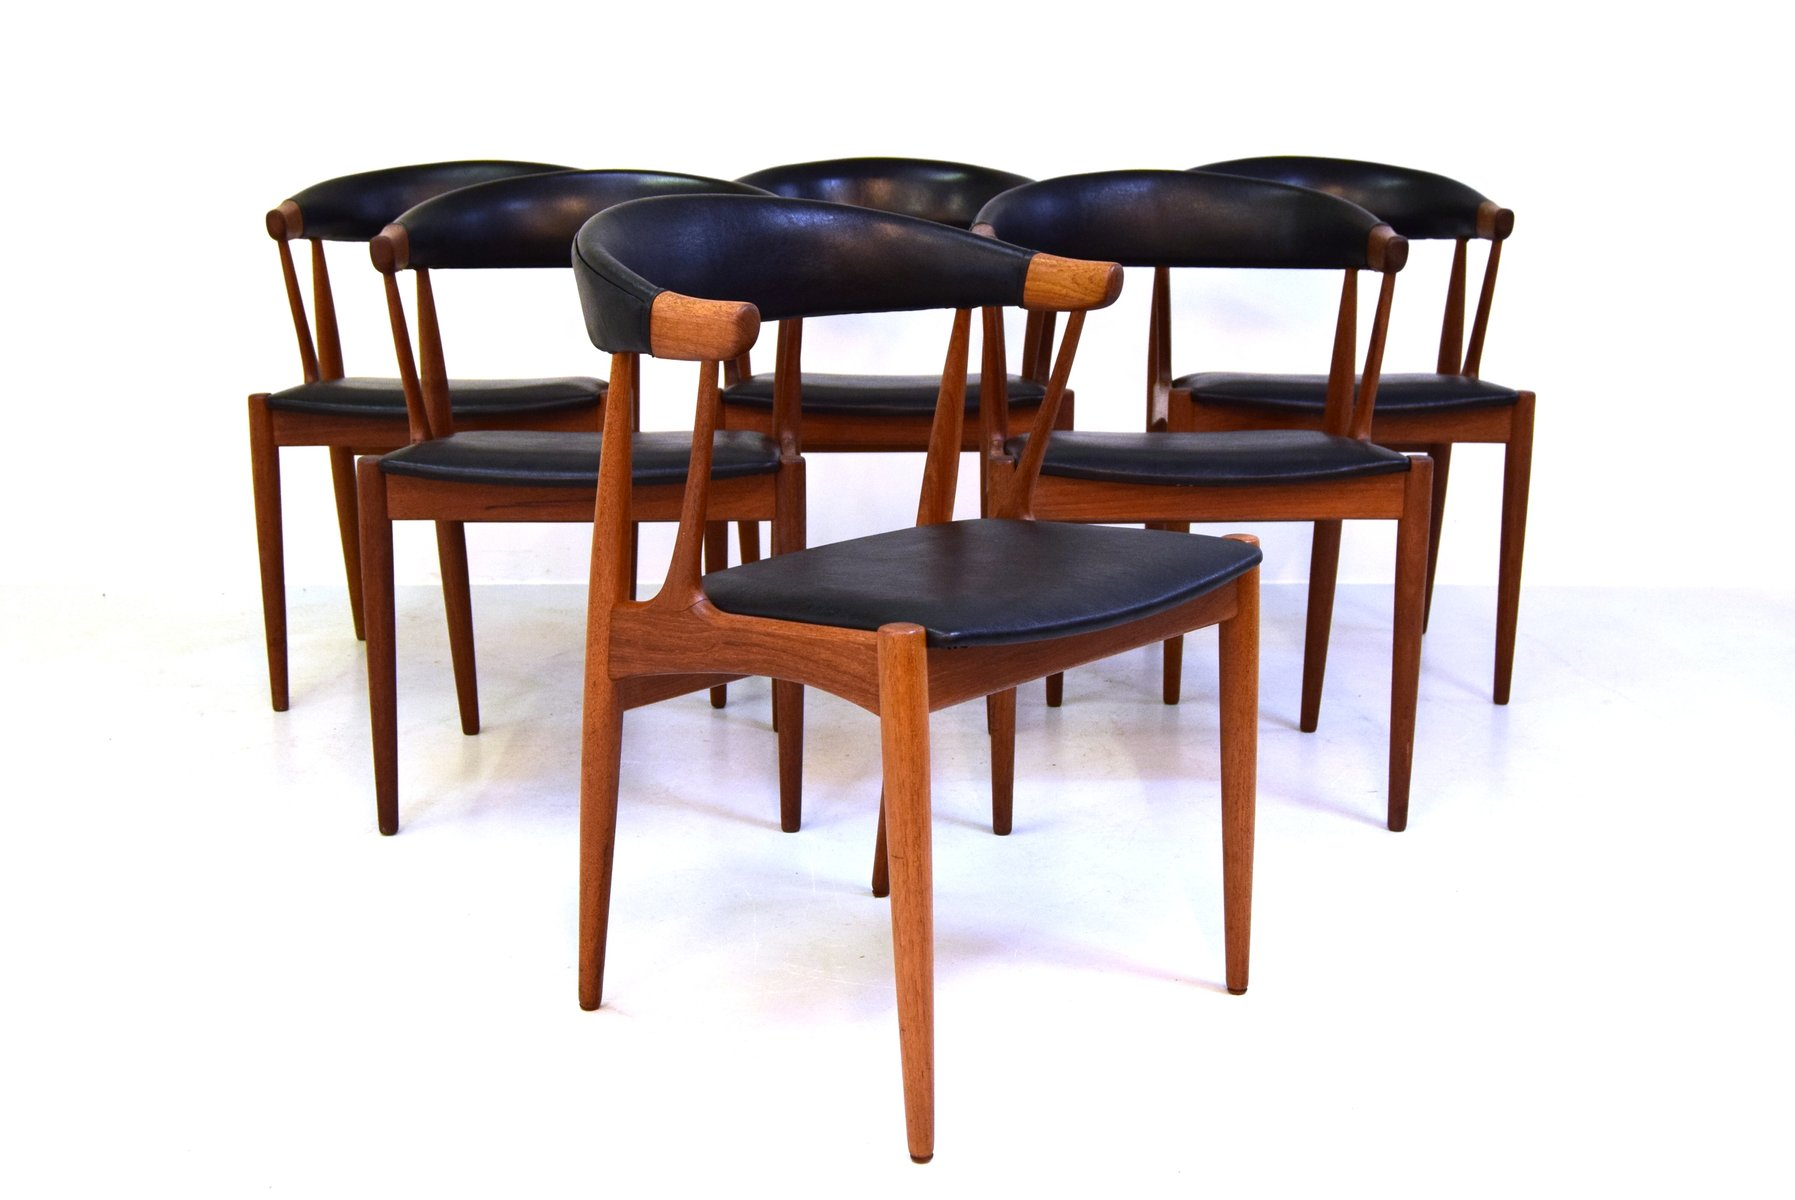 Chaises de Salon Mod232le BA 113 par Brdr Johannes  : model ba 113 dining chairs by brdr johannes andersen for andersens mobelfabrik set of 6 from www.pamono.fr size 1795 x 1200 jpeg 110kB